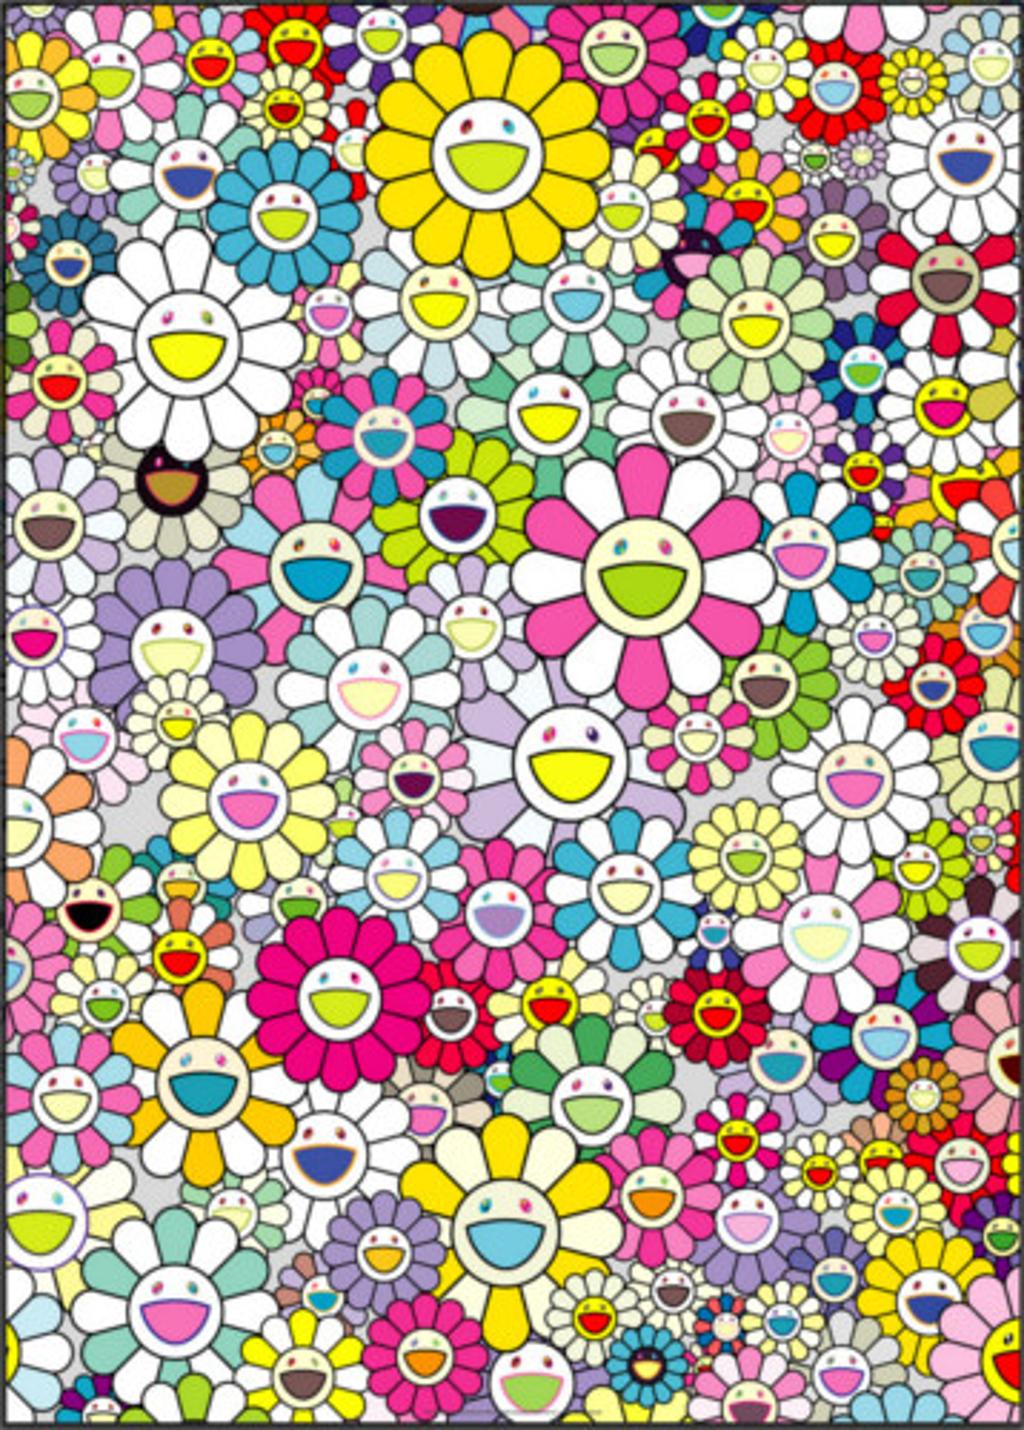 Shangri-La Shangri-La Multicolor by Takashi Murakami (b. 1962)